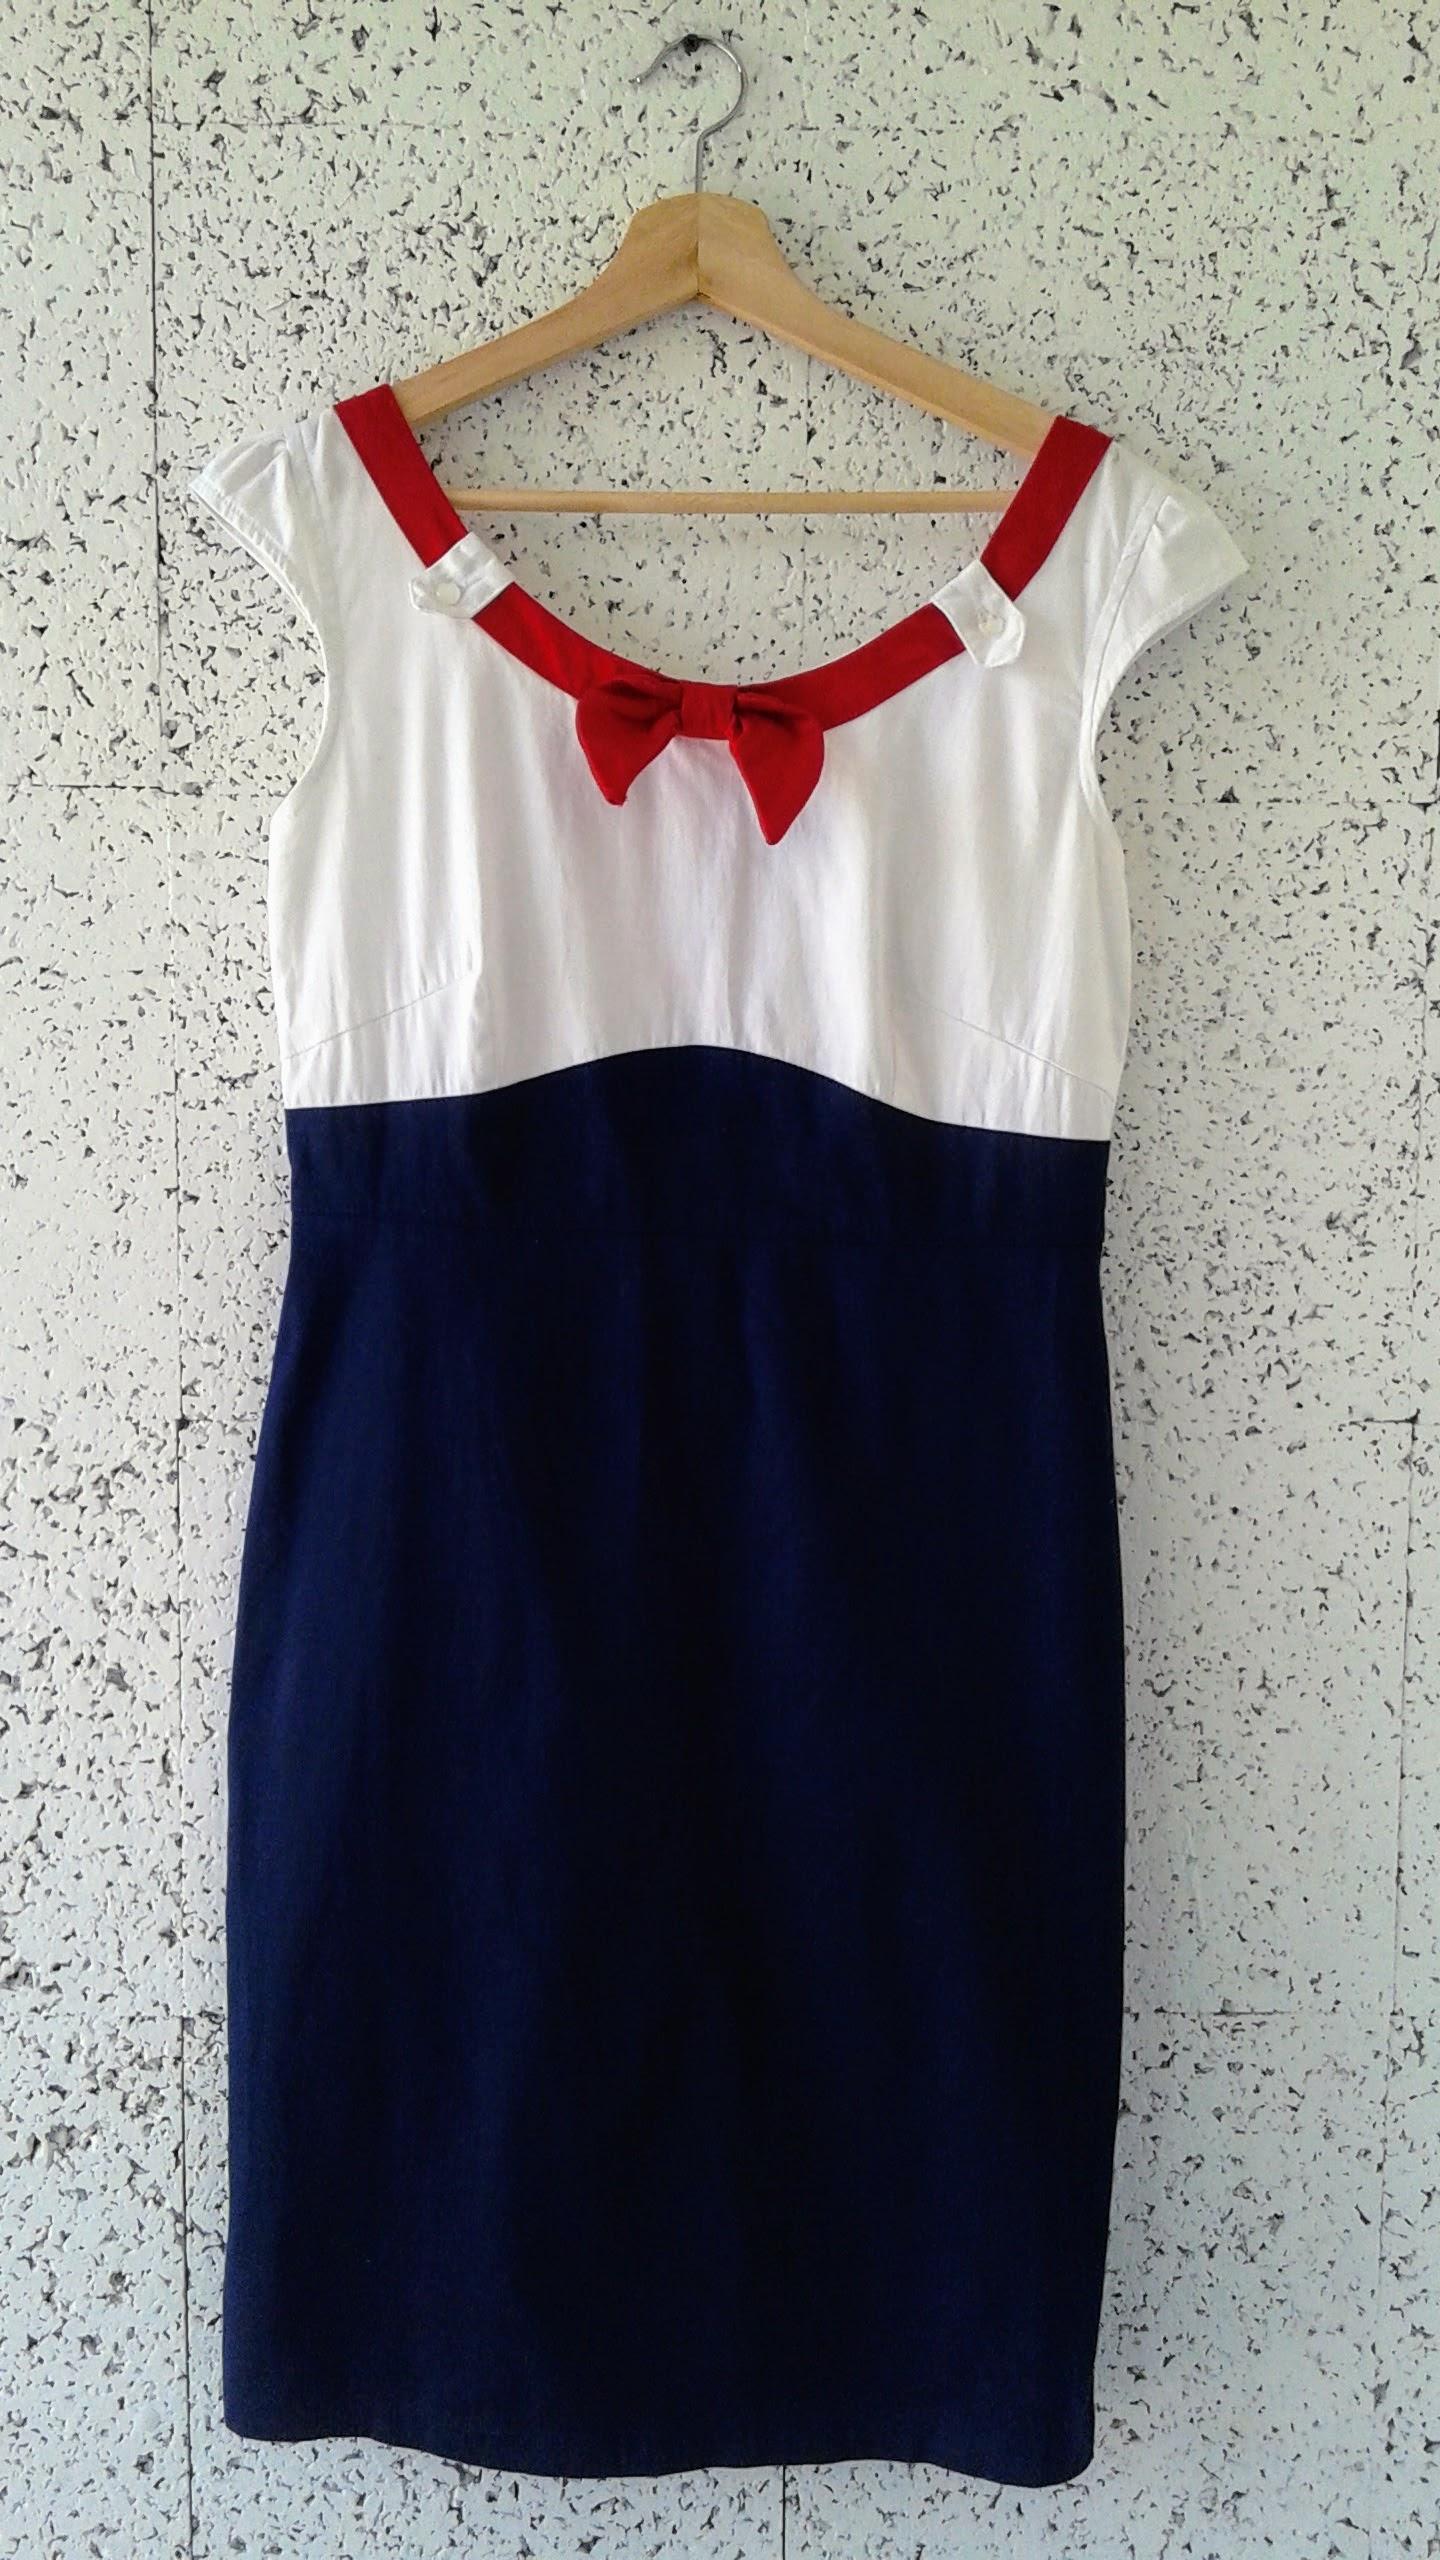 Steady dress; Size L, $34